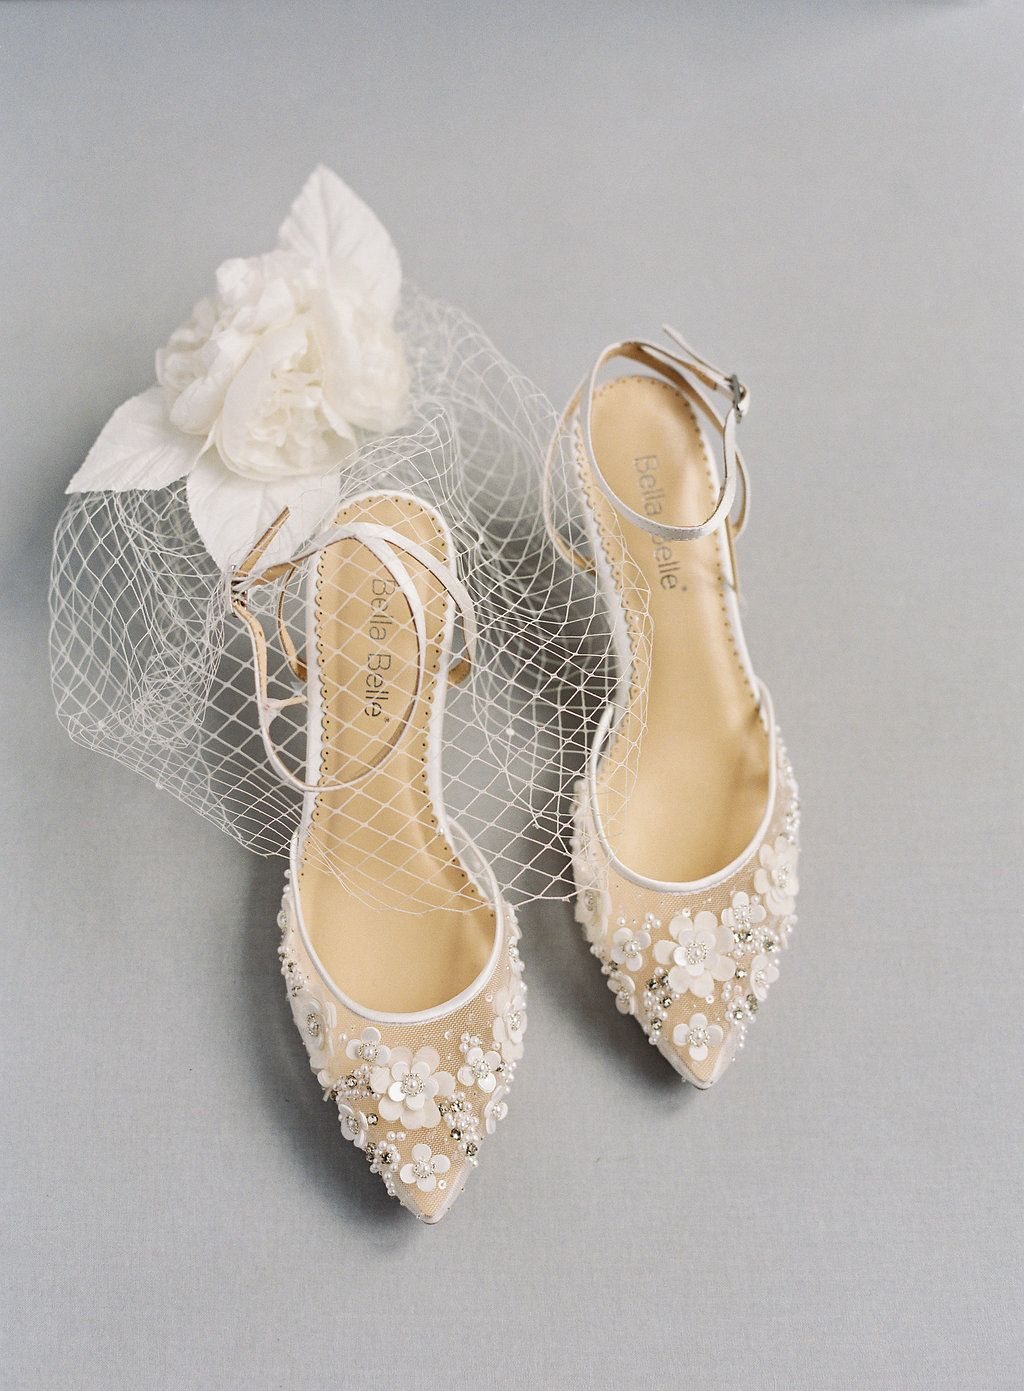 Euphoria Wedding shoes, Wedding shoes bride, Bride shoes